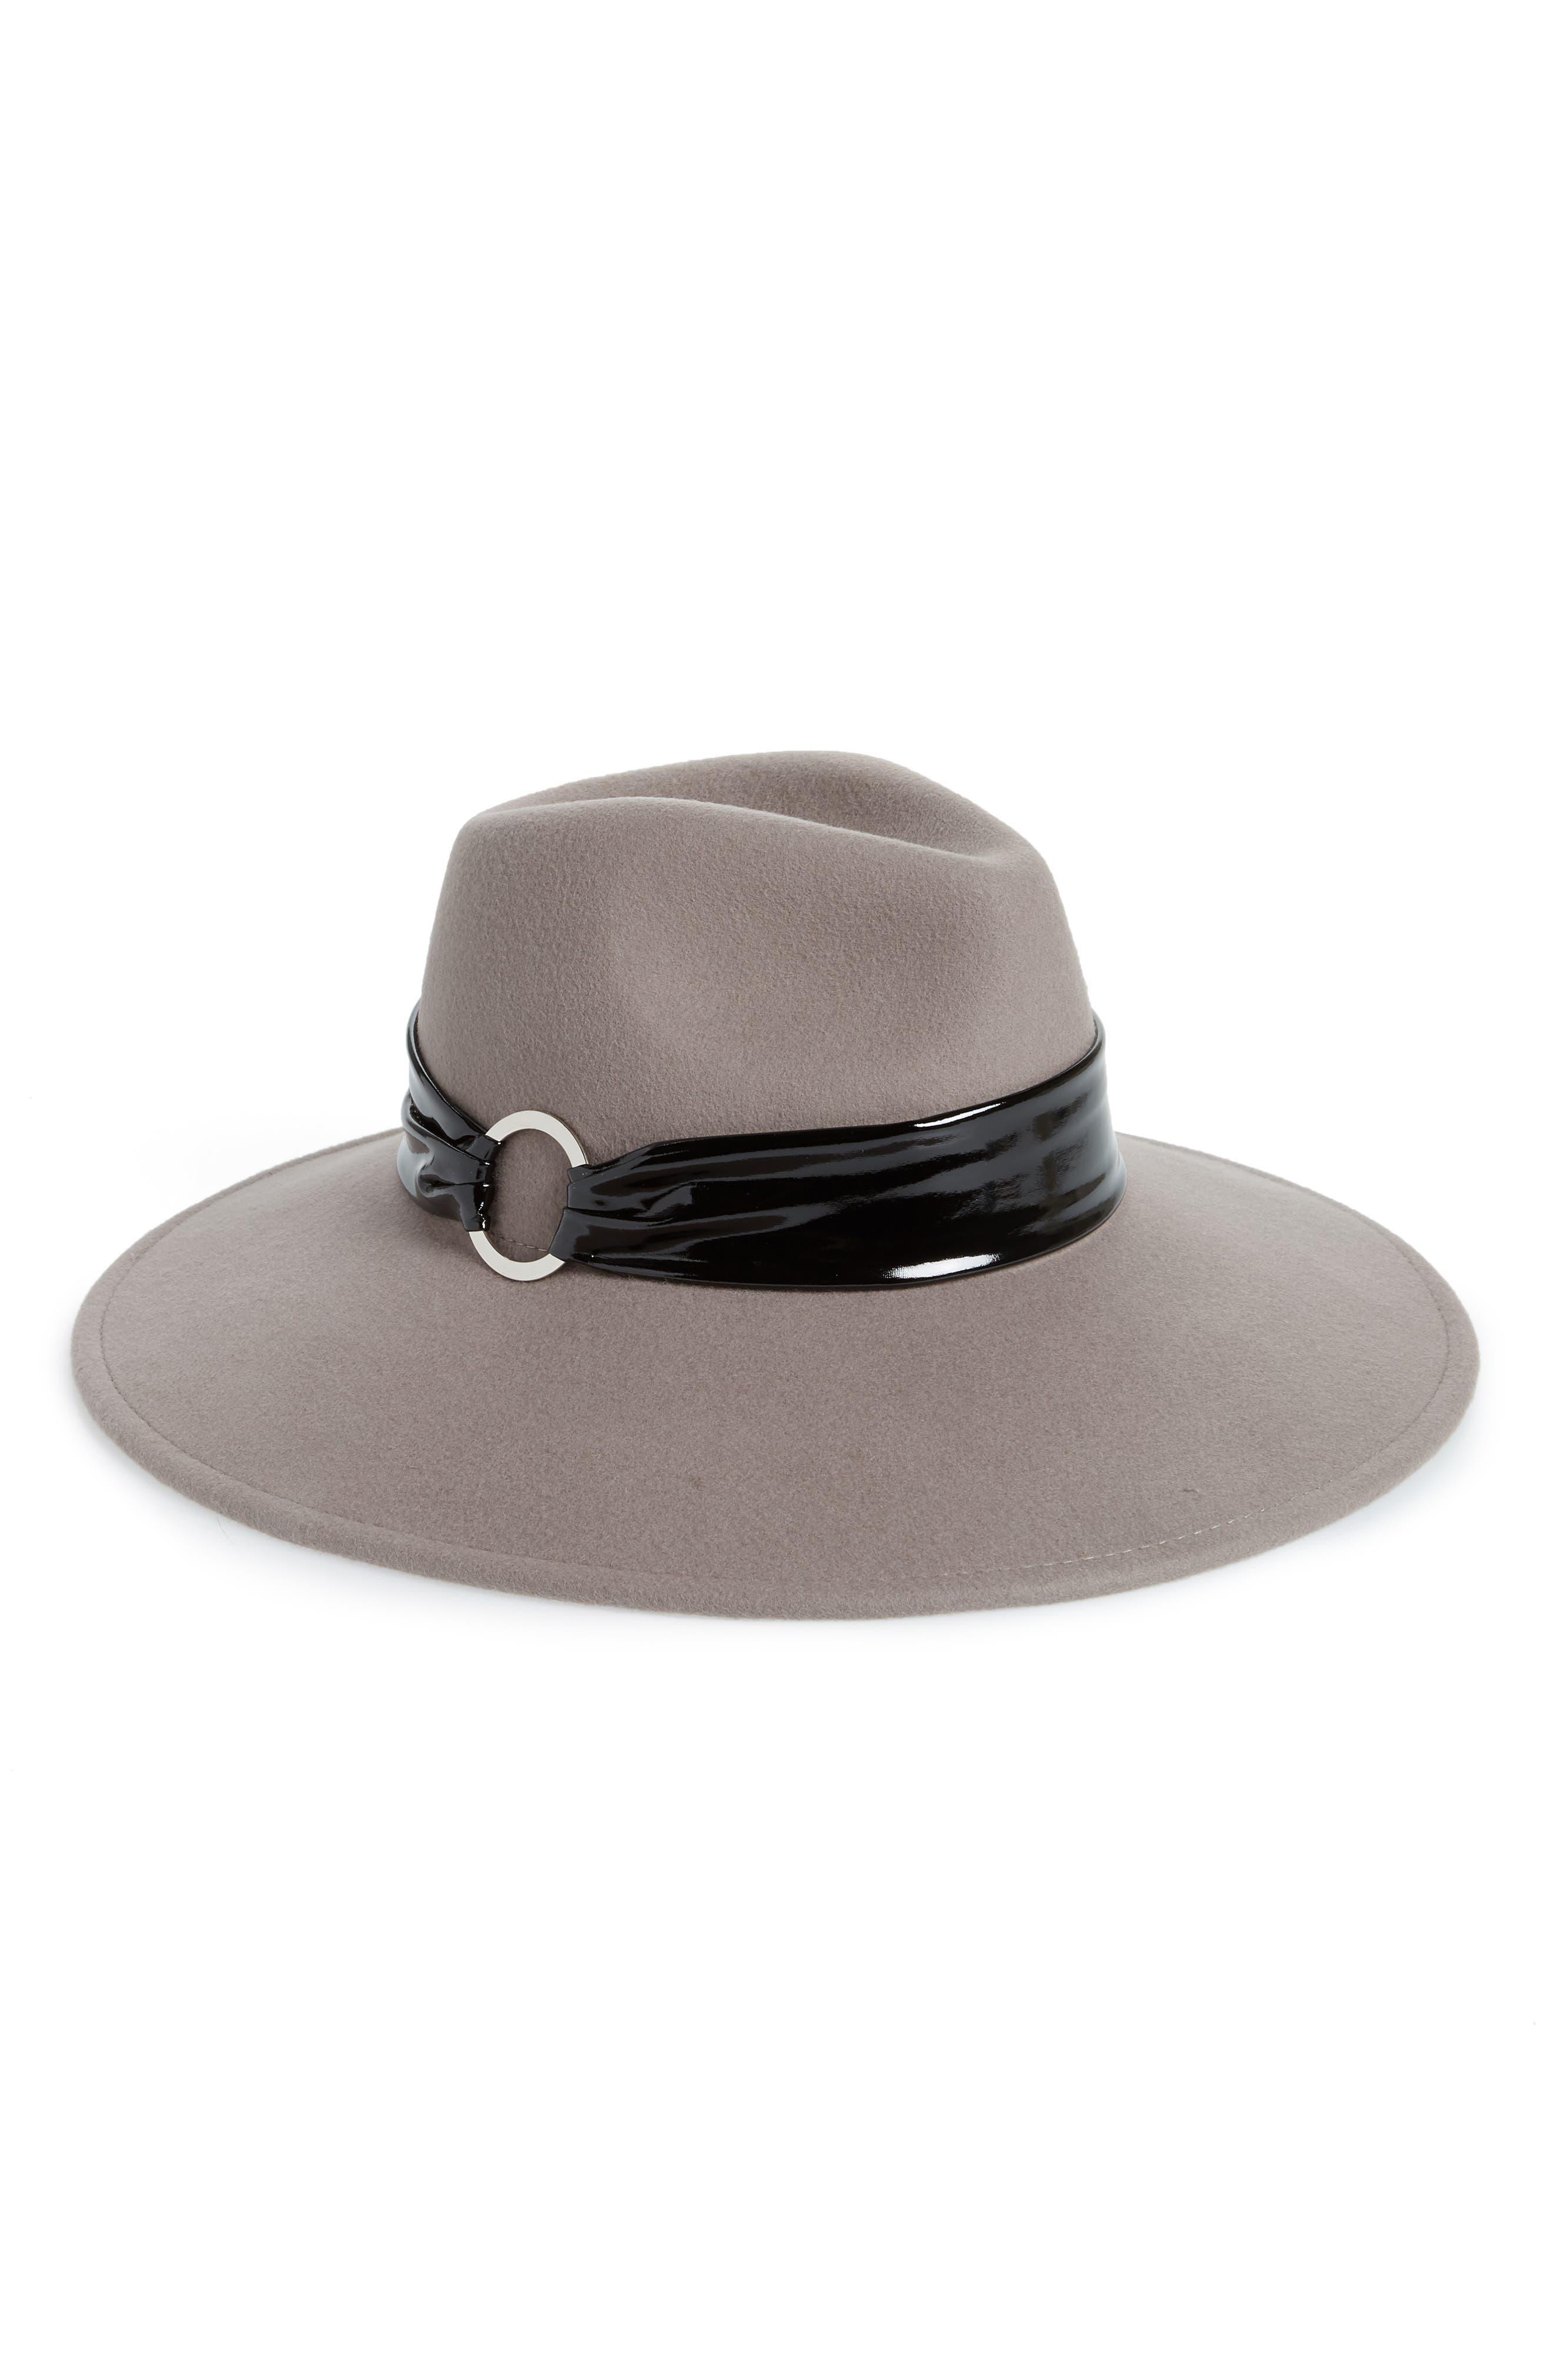 GENIE BY EUGENIA KIM Naomi Felted Wool Hat - Purple in Mink